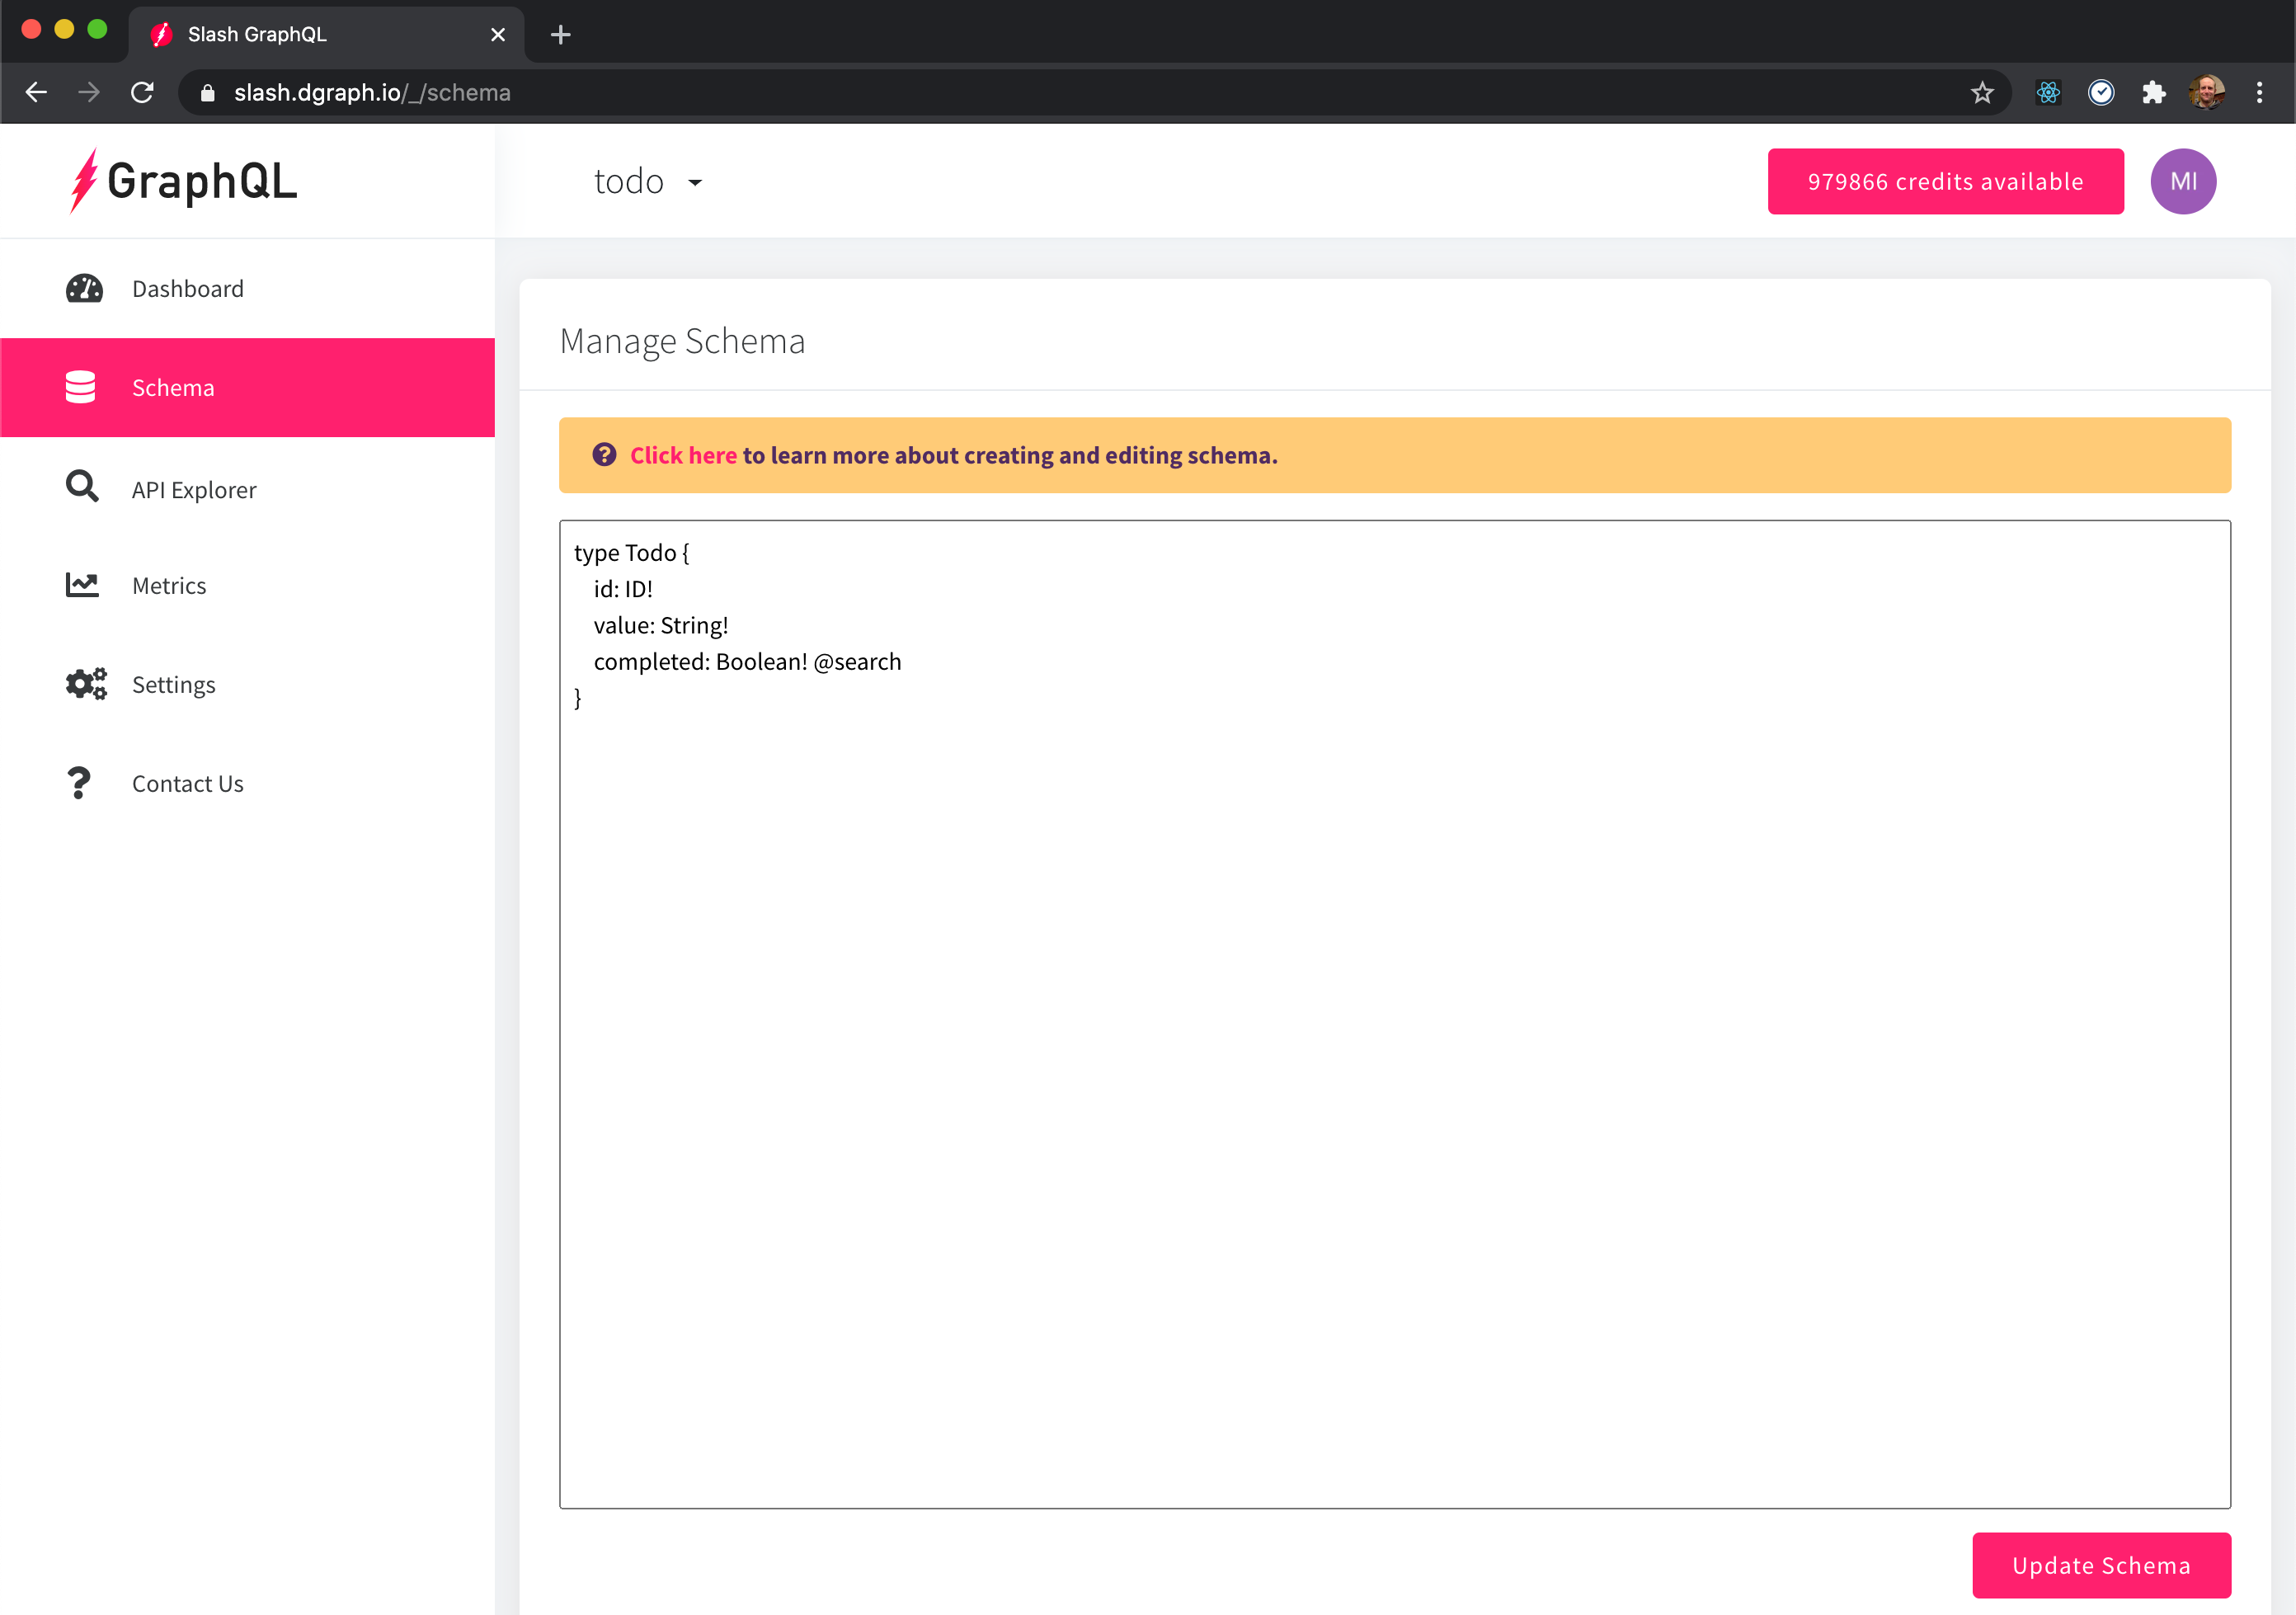 Slash-GraphQL: submiting GraphQL schema